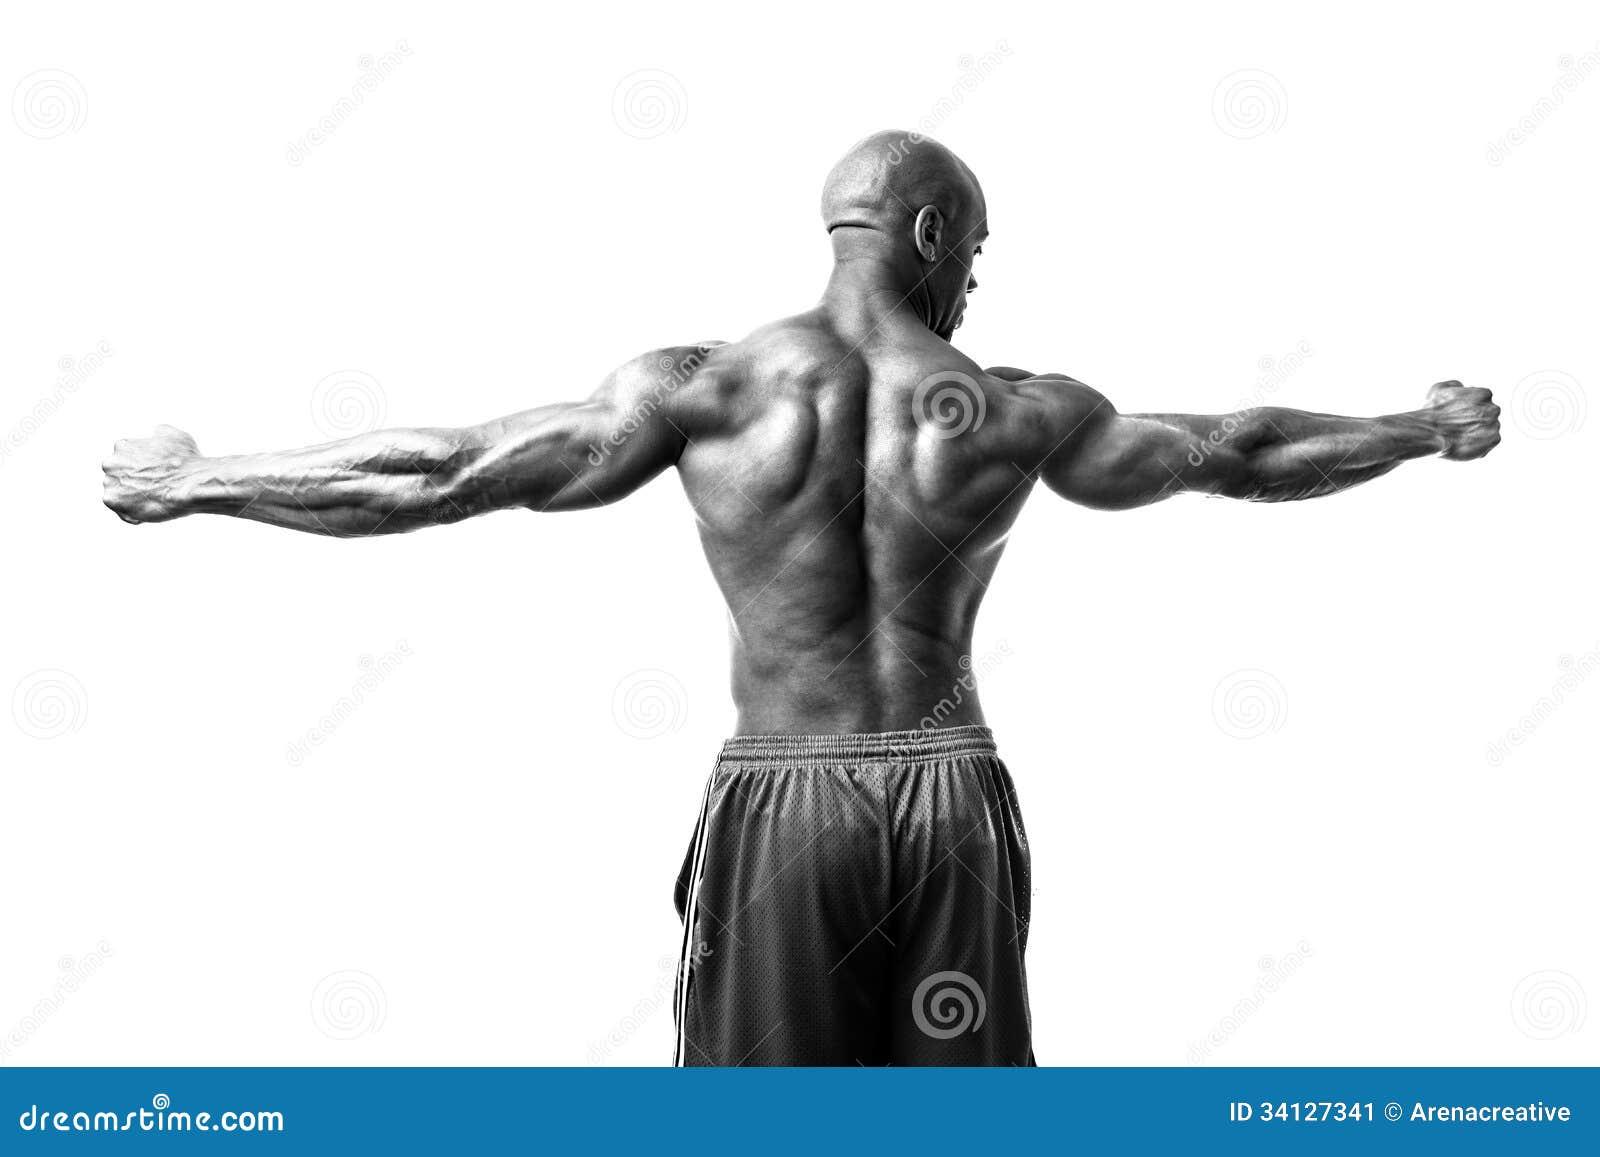 Bodybuilder Arms Spread Stock Image - Image: 34127341